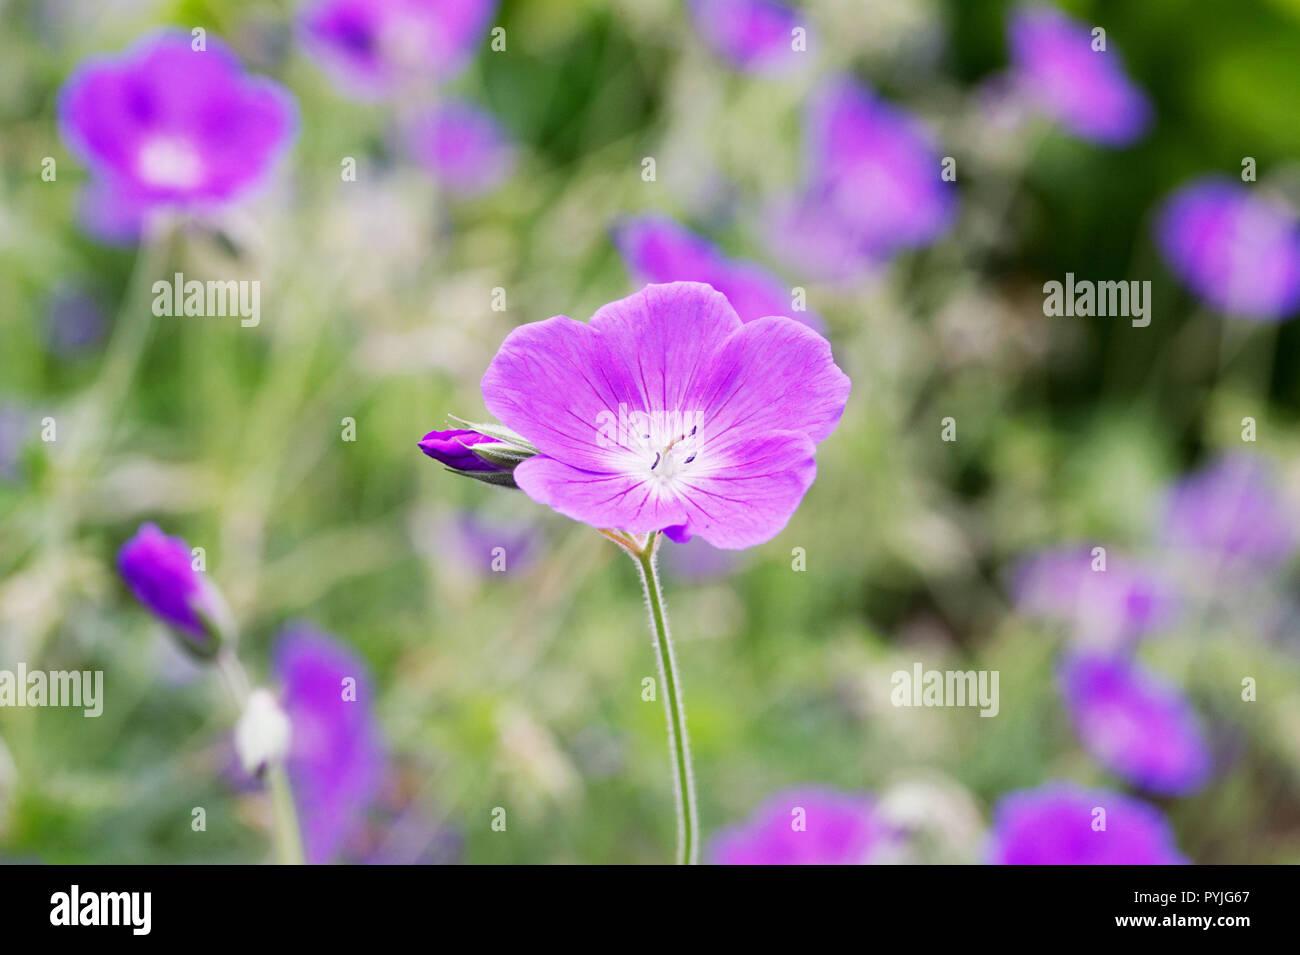 Geranium 'Orion' flowers. - Stock Image